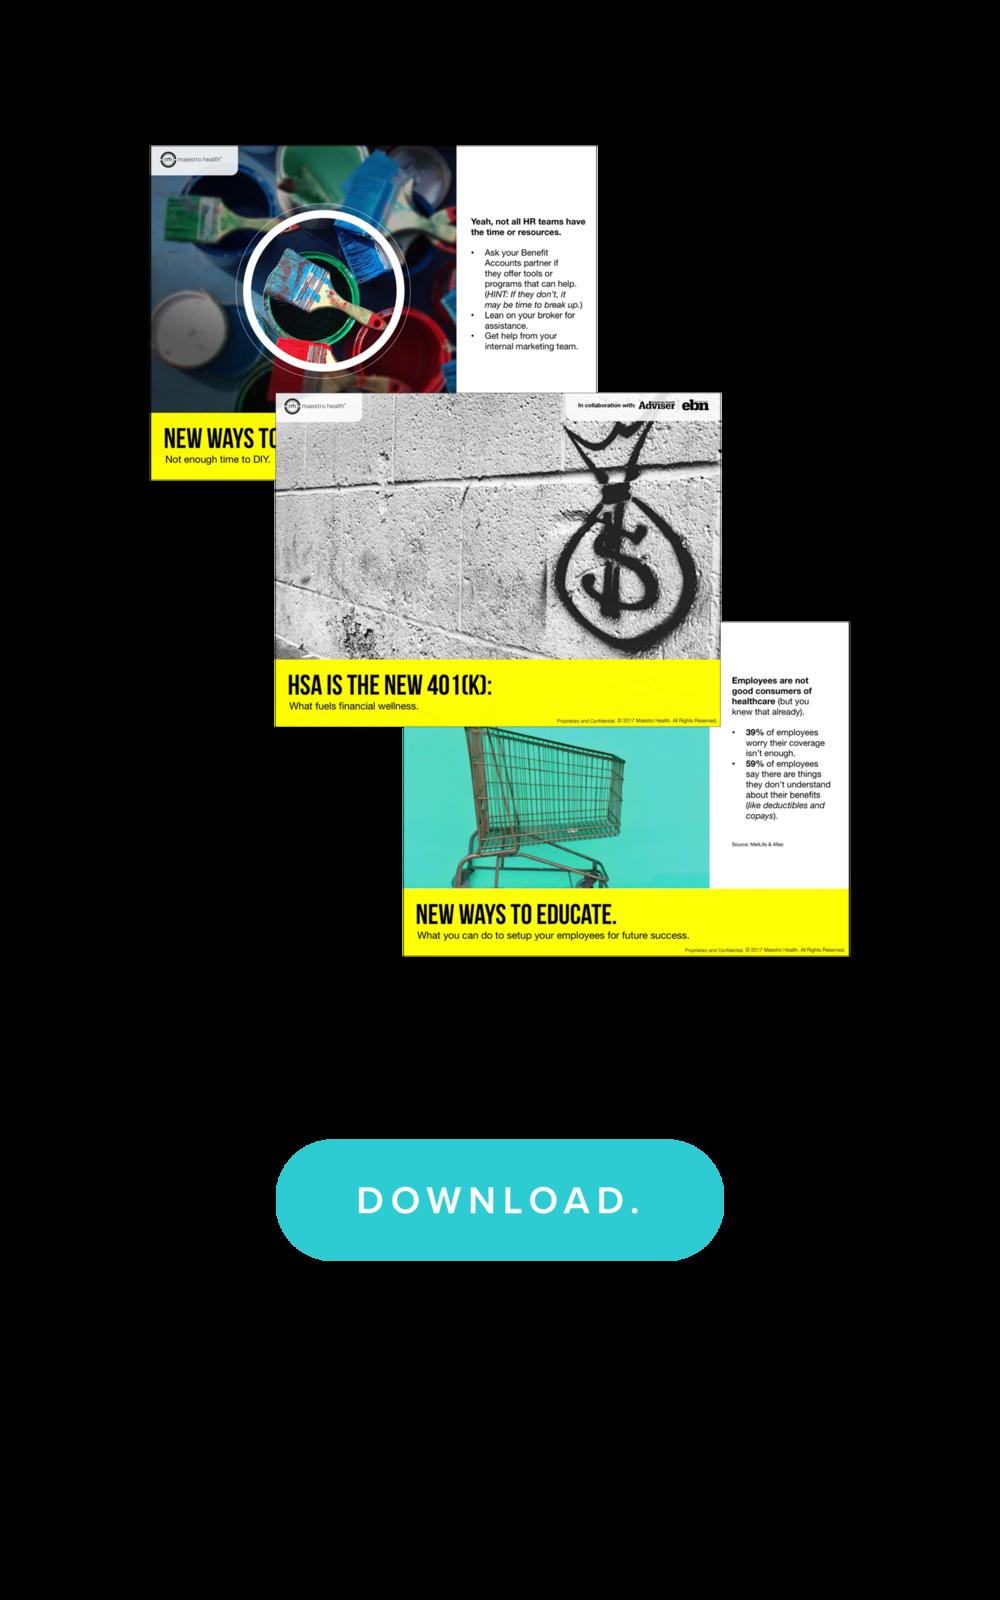 LandingPage_JulyBenAccts_Webinar_Imagery_Infographics_082217_r87.png